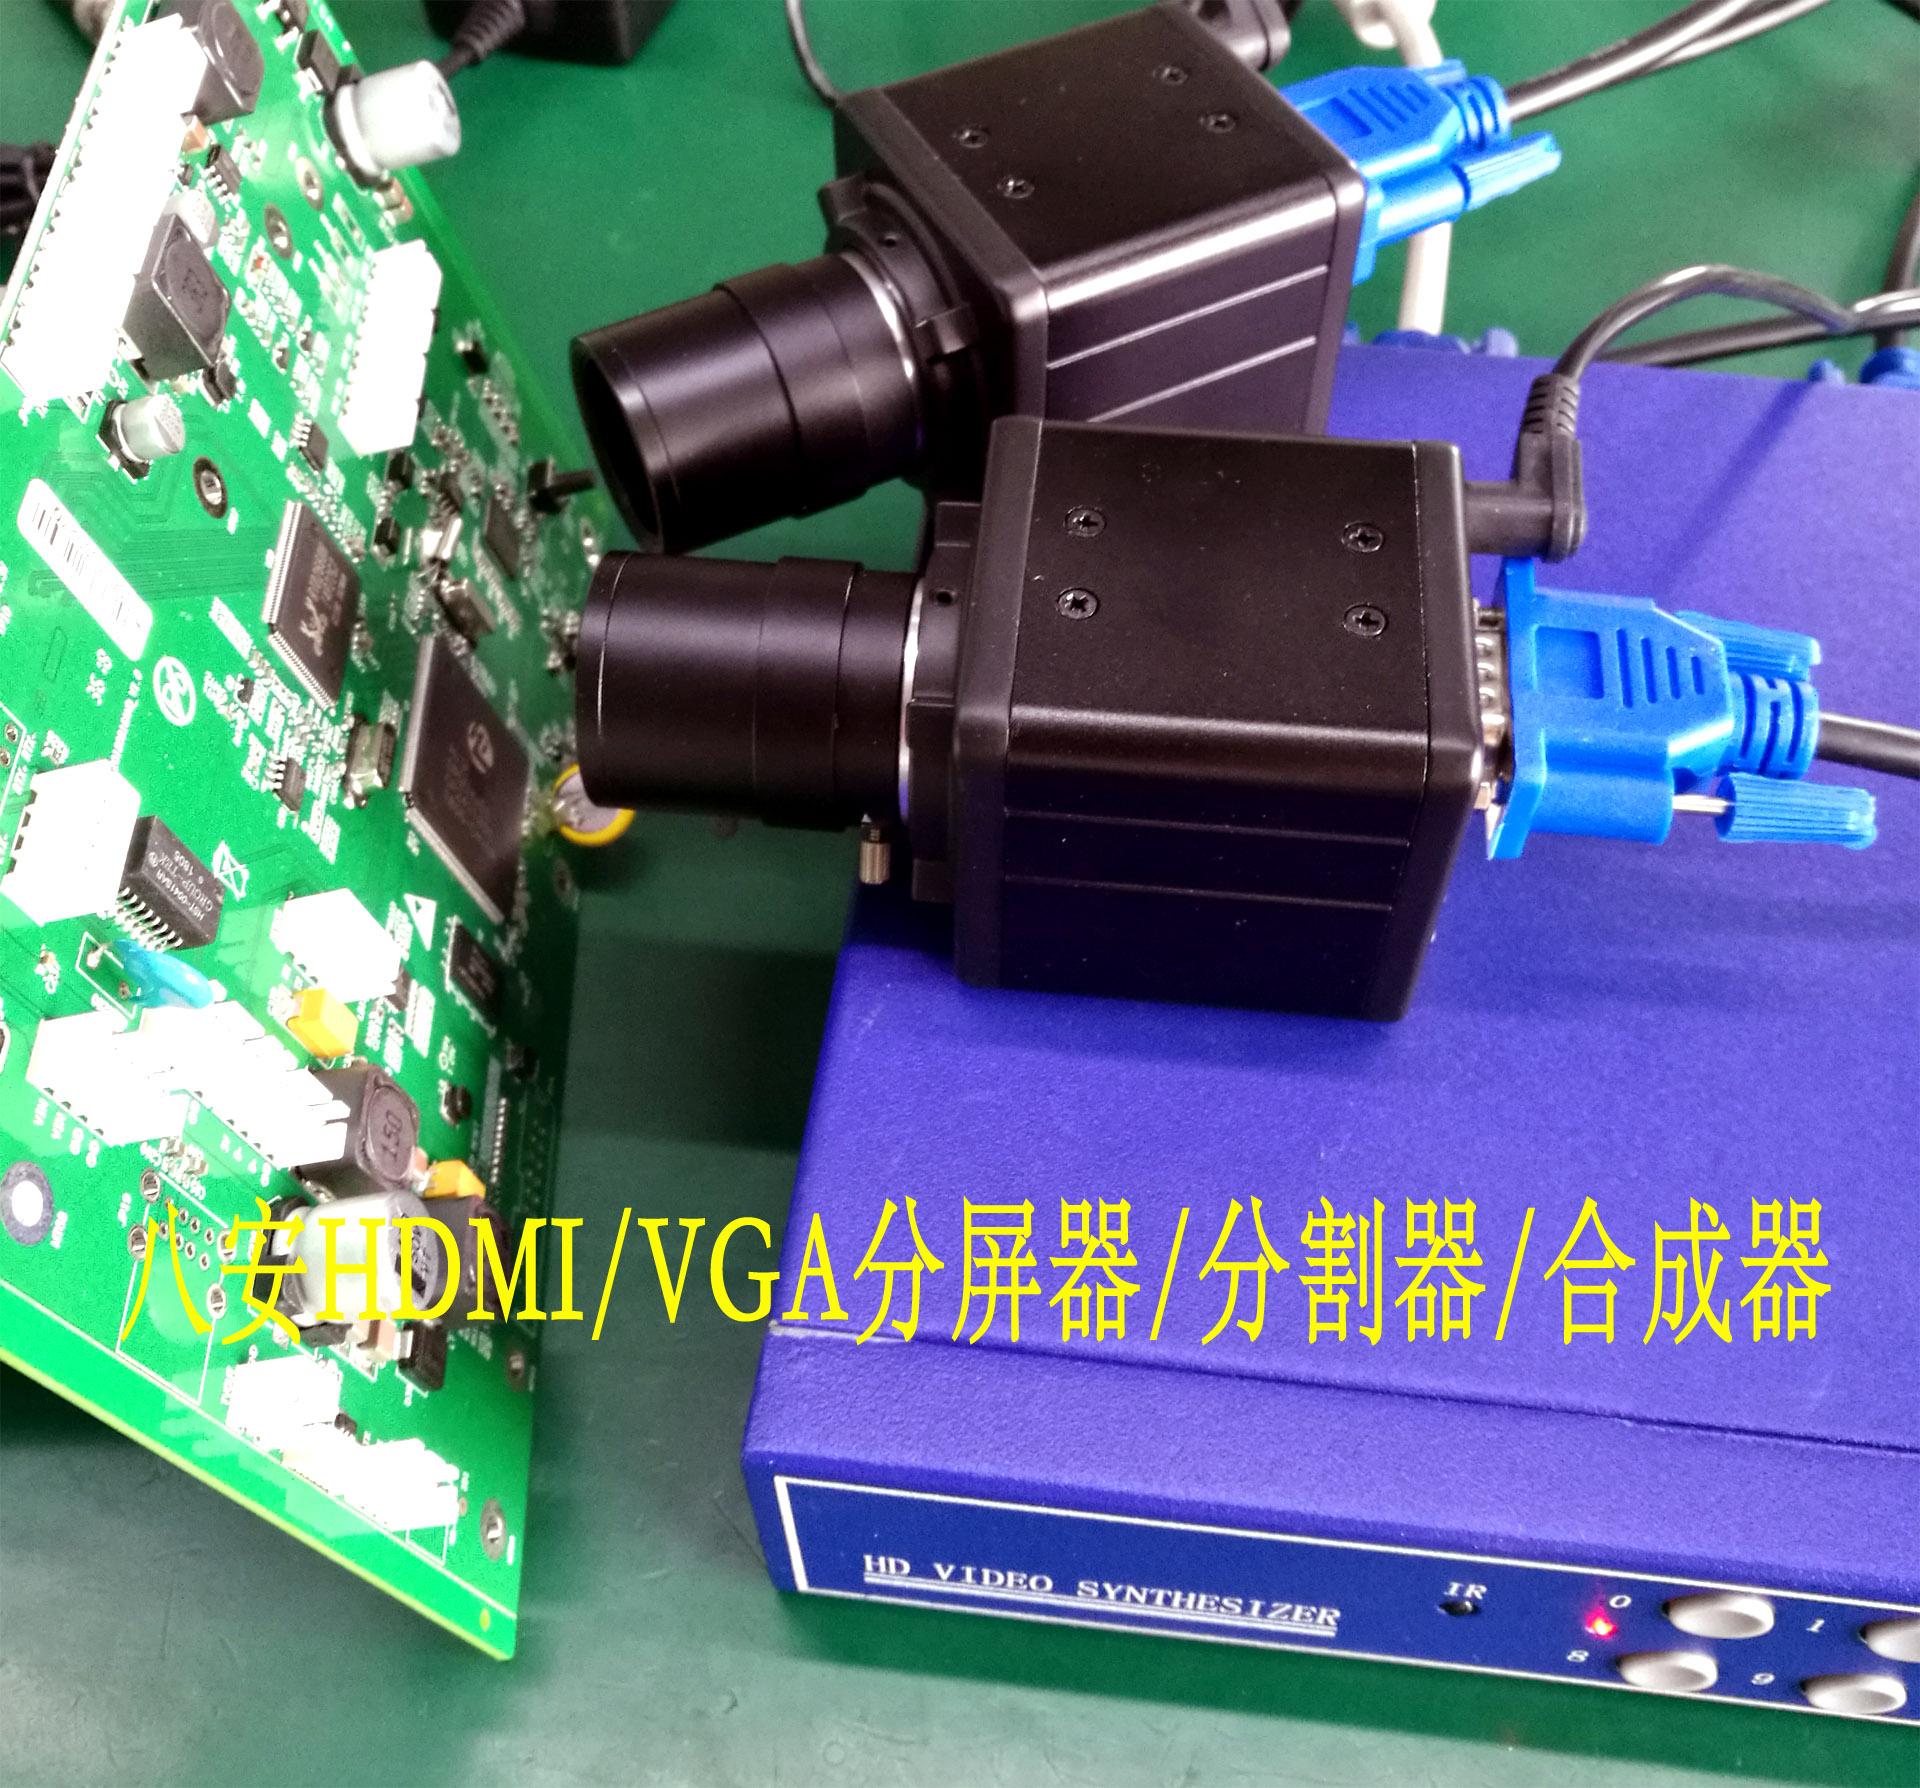 八安HDMI VGA分割器分屏器合成器2